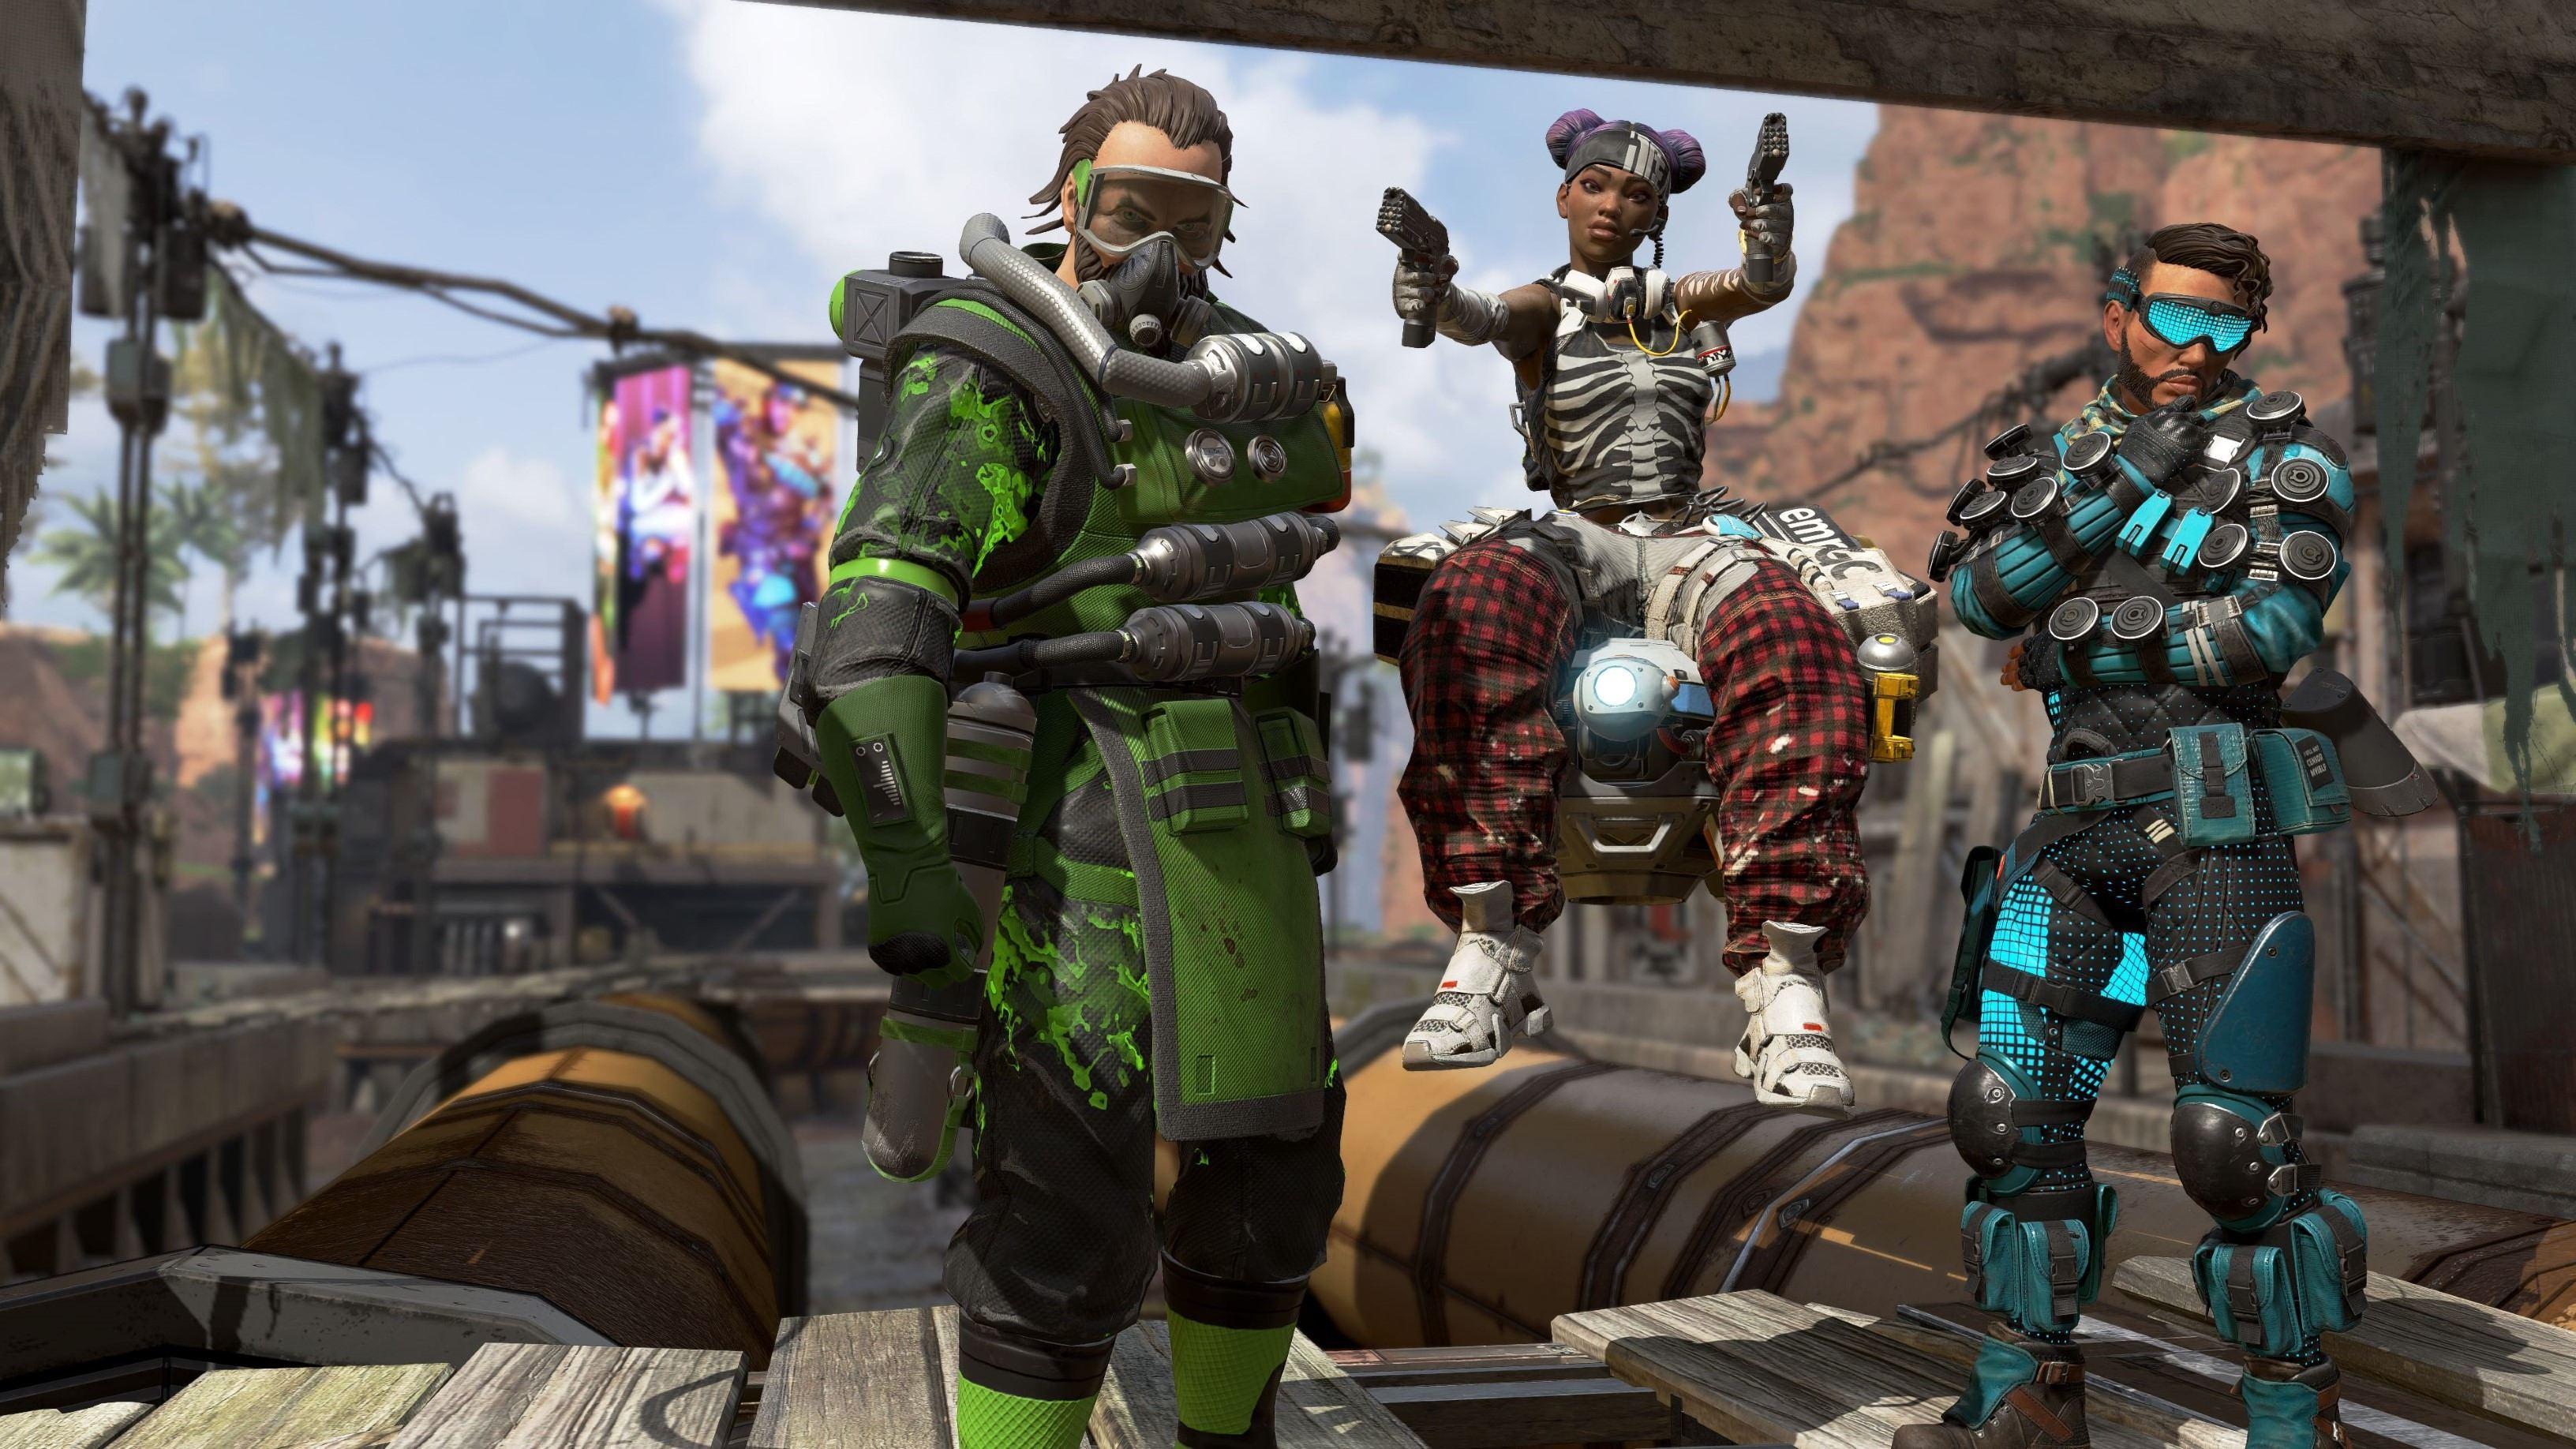 APEX_Legends_Screenshot_BYC_CausLifeMirage_Banners_Alt_04_Clean